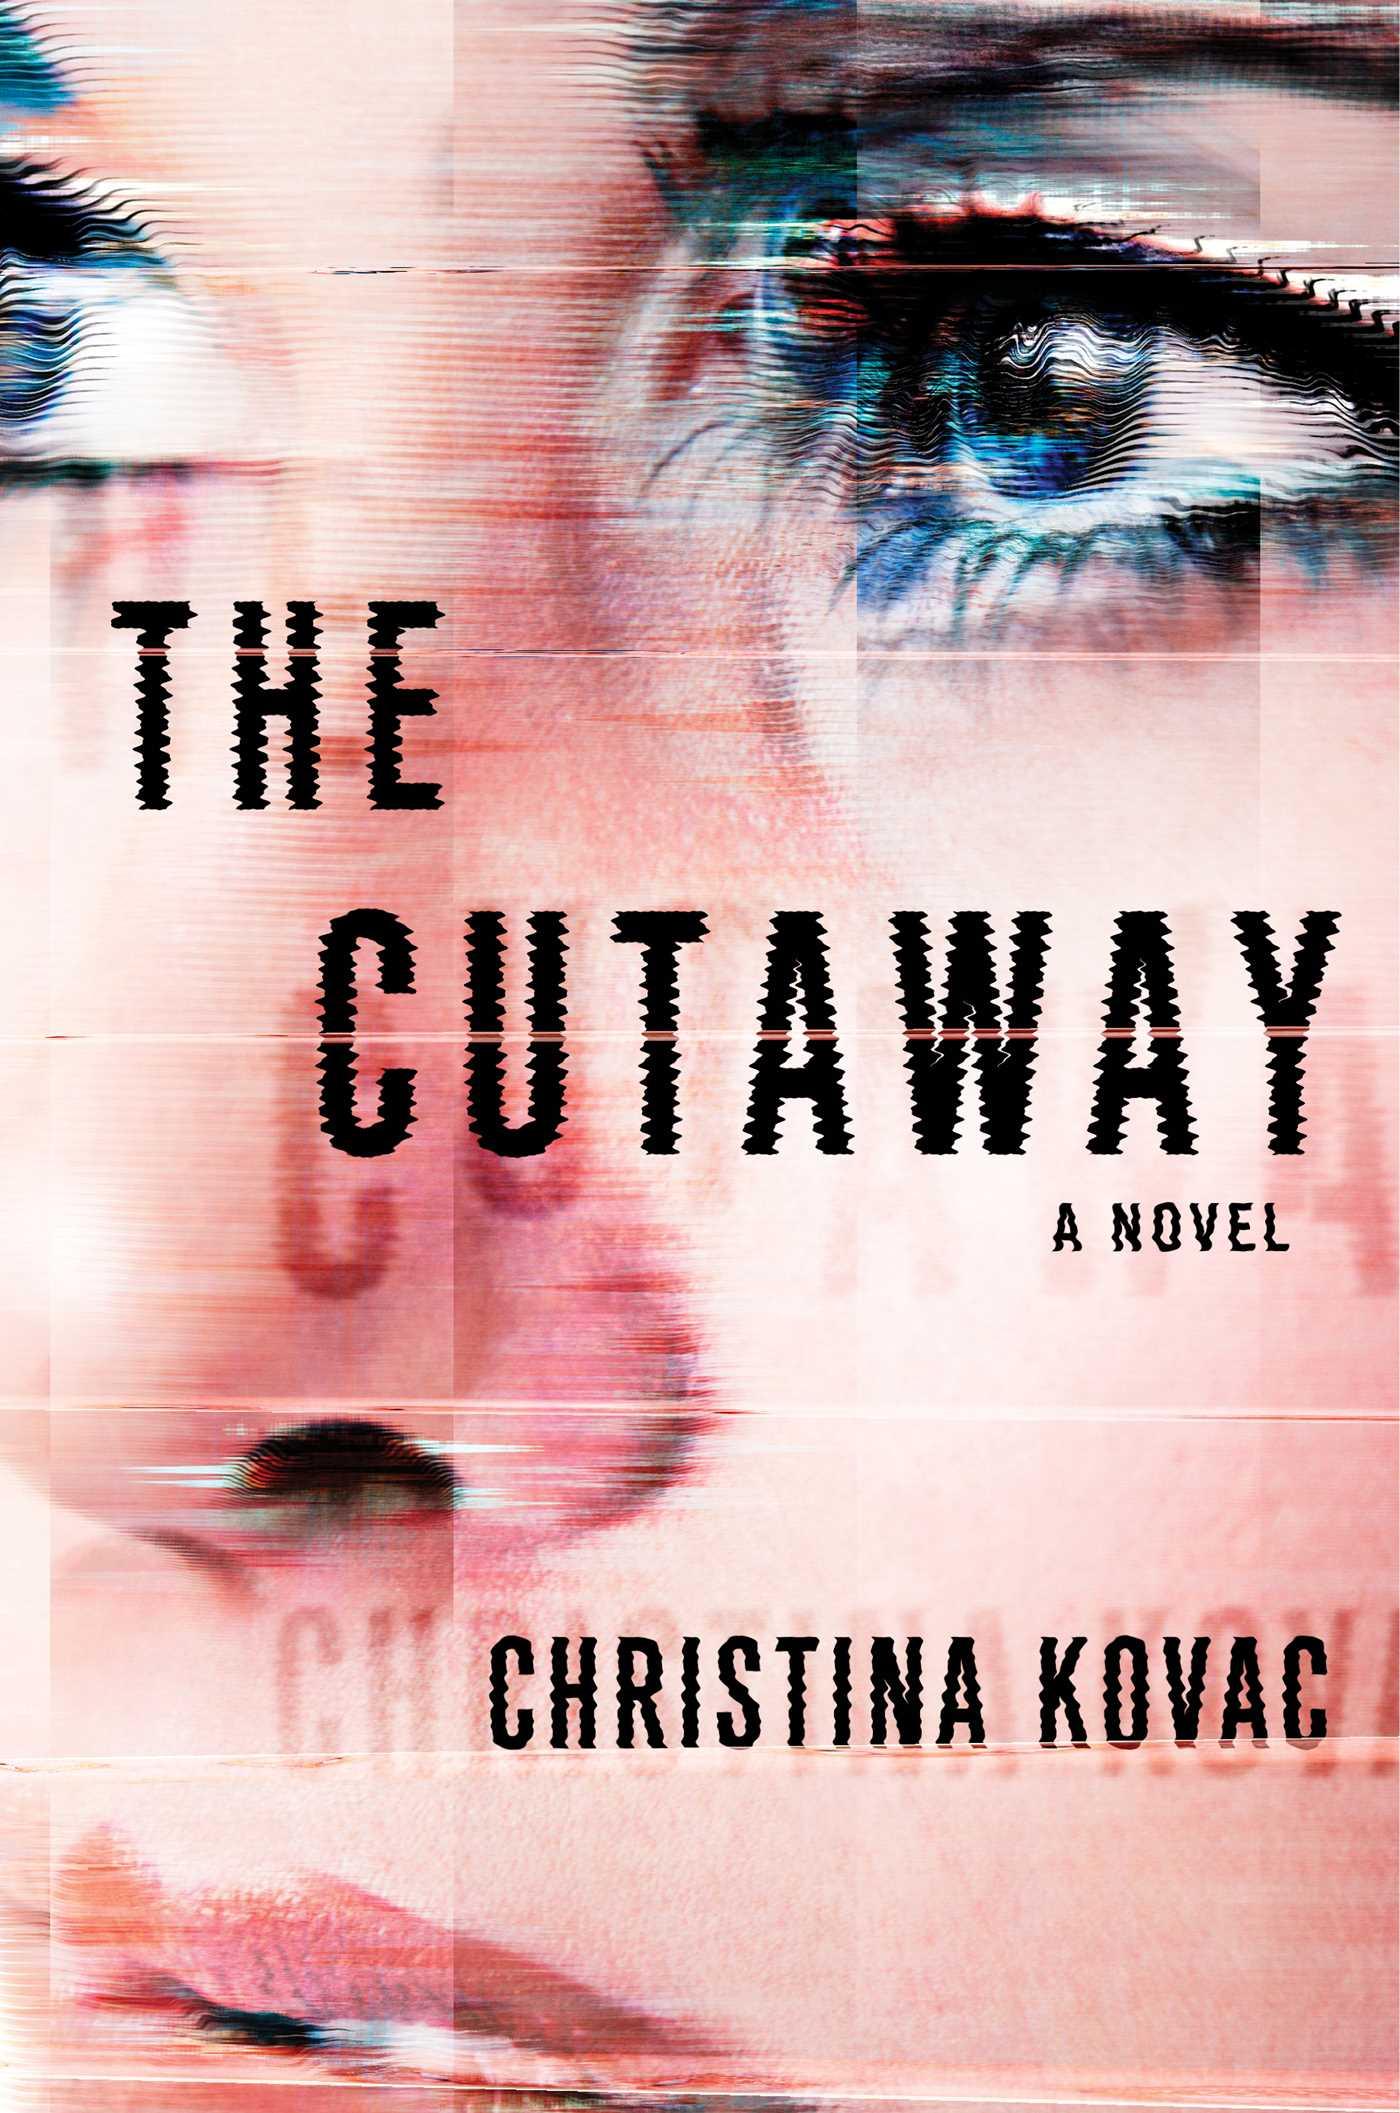 The Cutaway, a political thriller by Christina Kovac